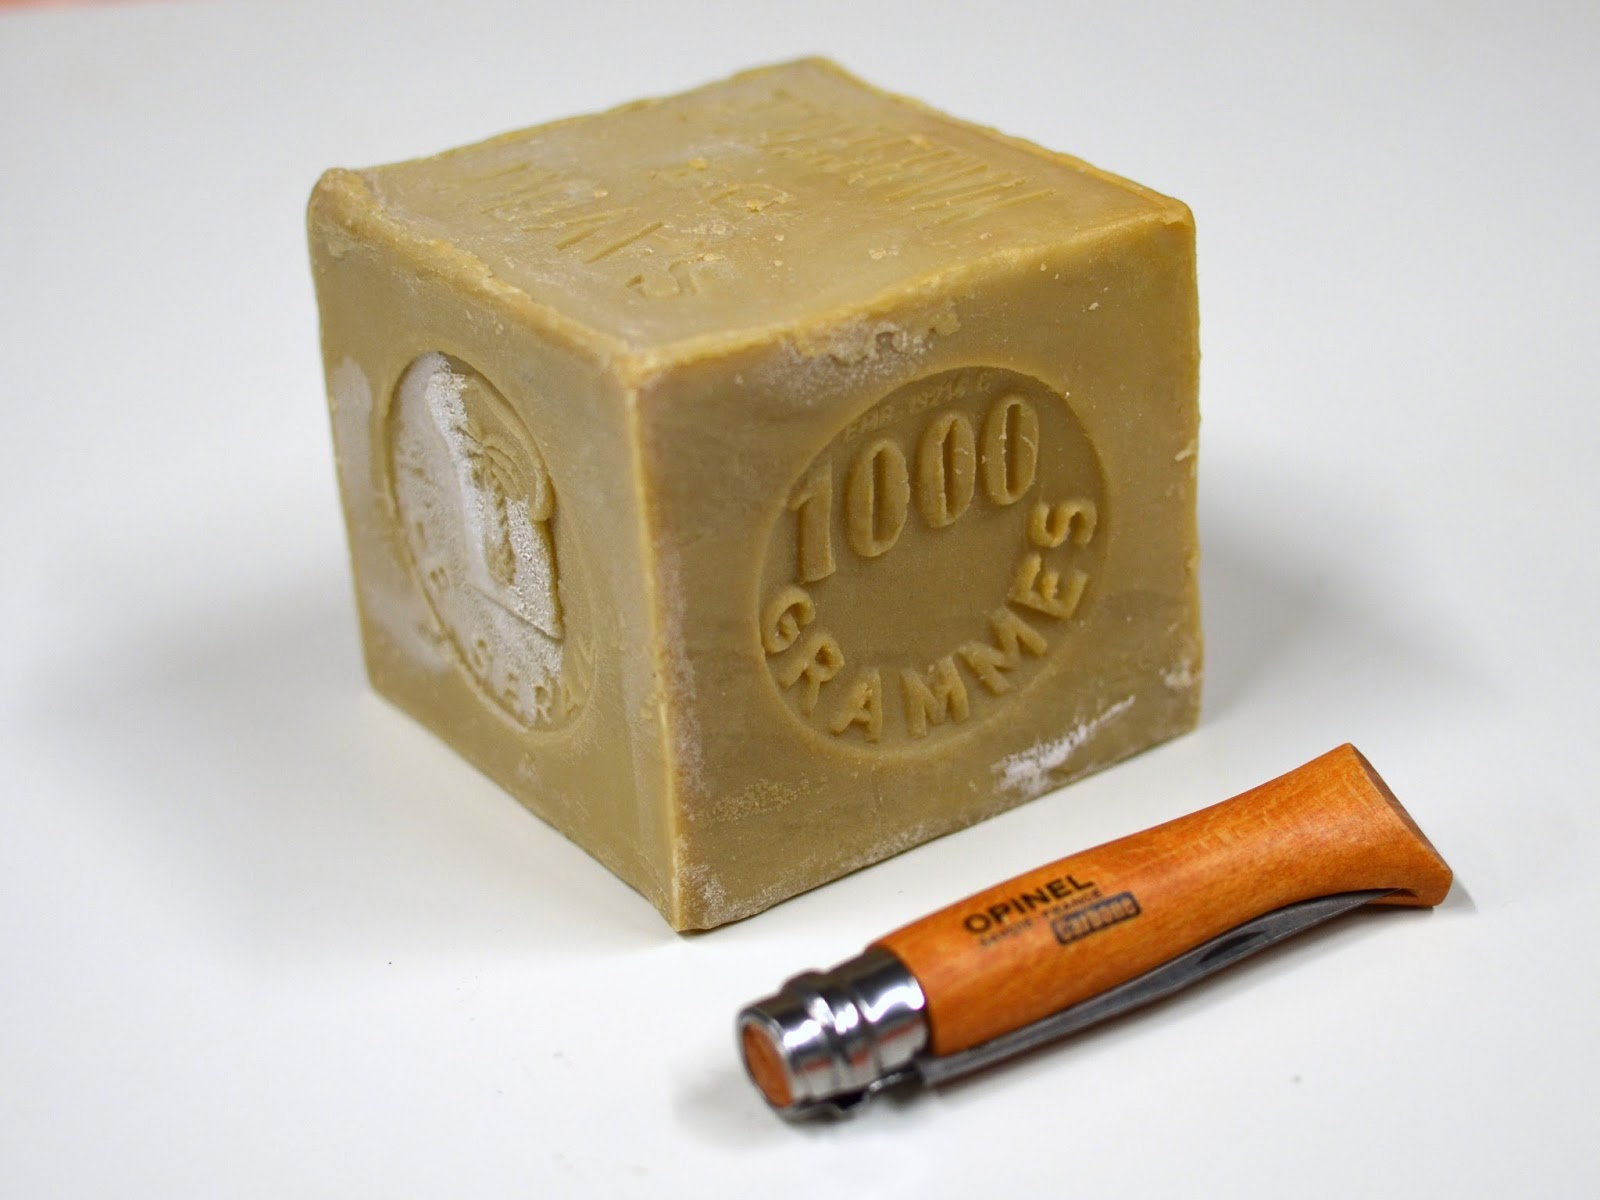 the velo orange blog savon de marseille tradtional french soap. Black Bedroom Furniture Sets. Home Design Ideas